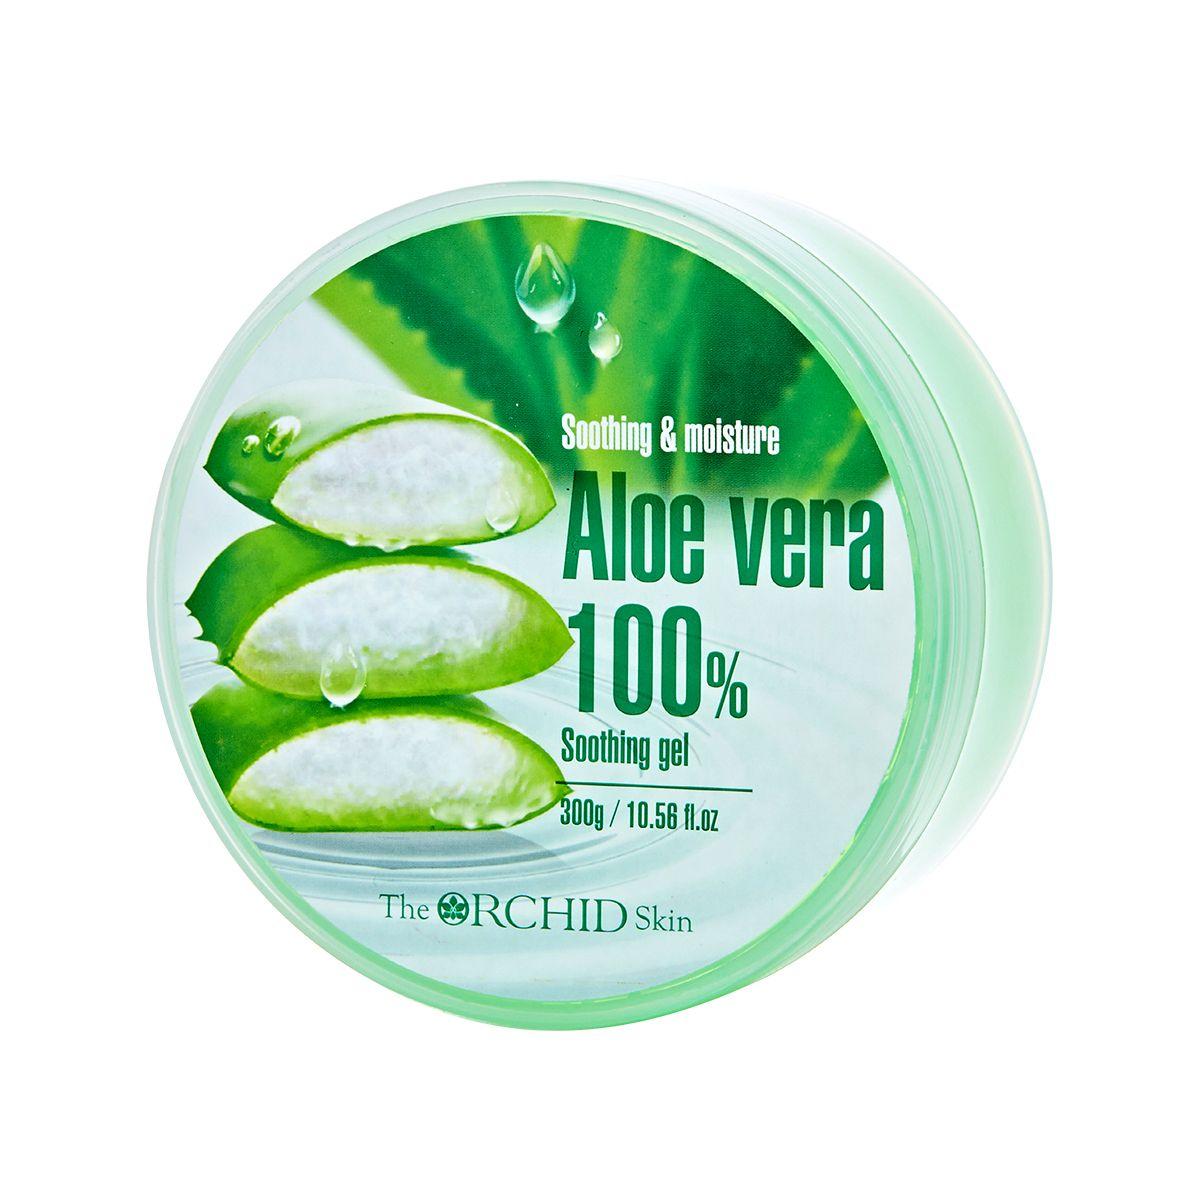 Многофункциональный гель с алое The Orchid Skin Aloe Soothing Gel - 300 мл